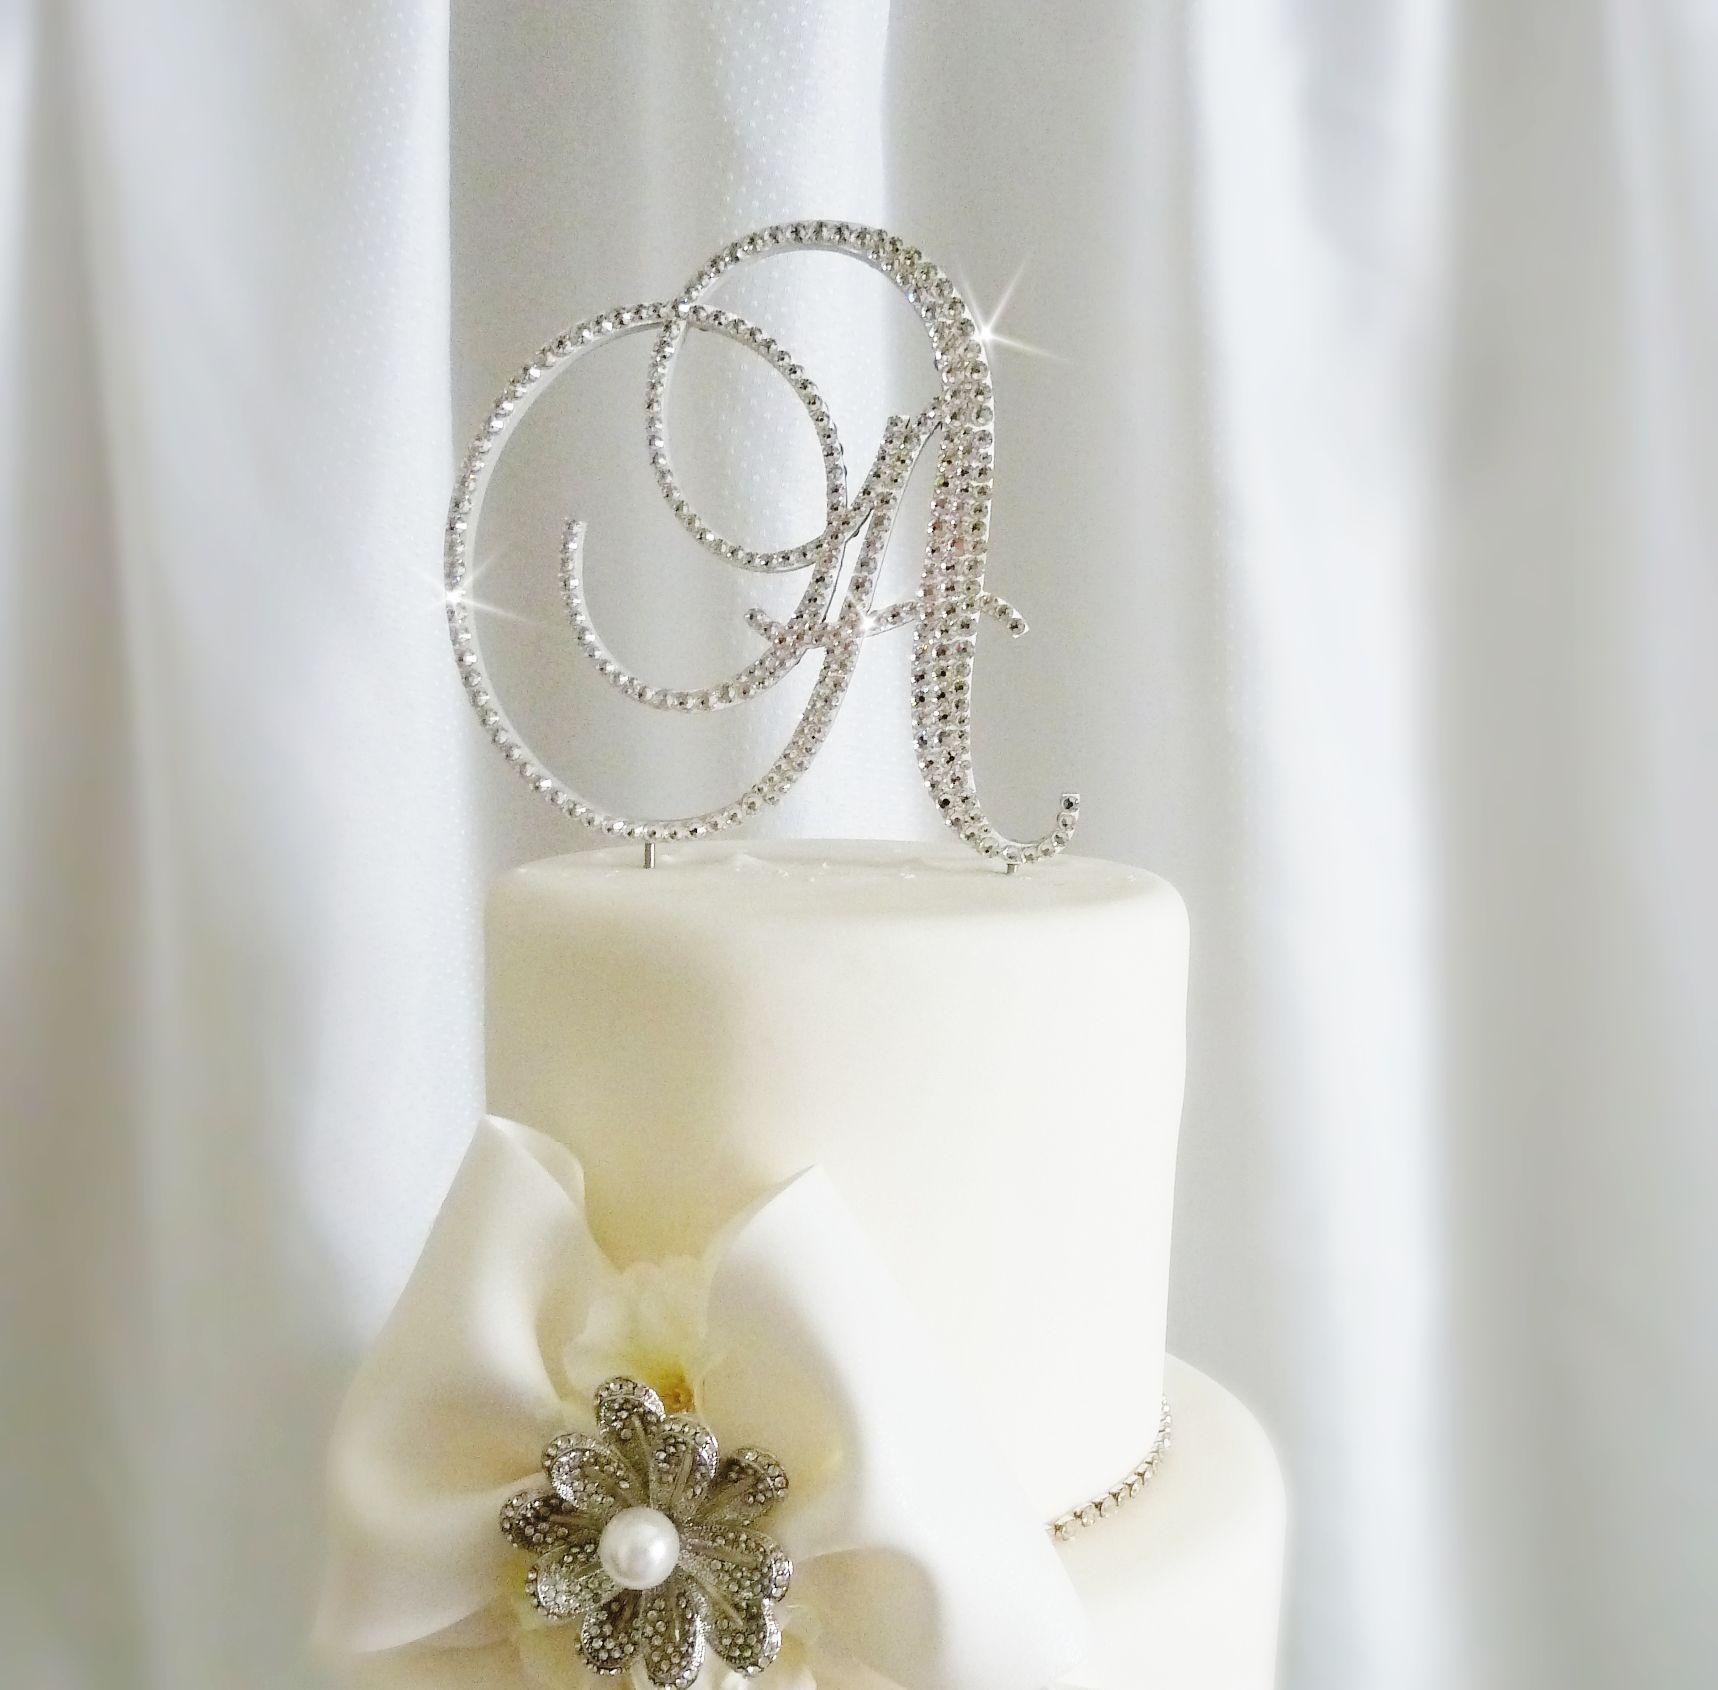 Crystal Monogram Wedding Cake Toppers | crystal cake topper brush ...